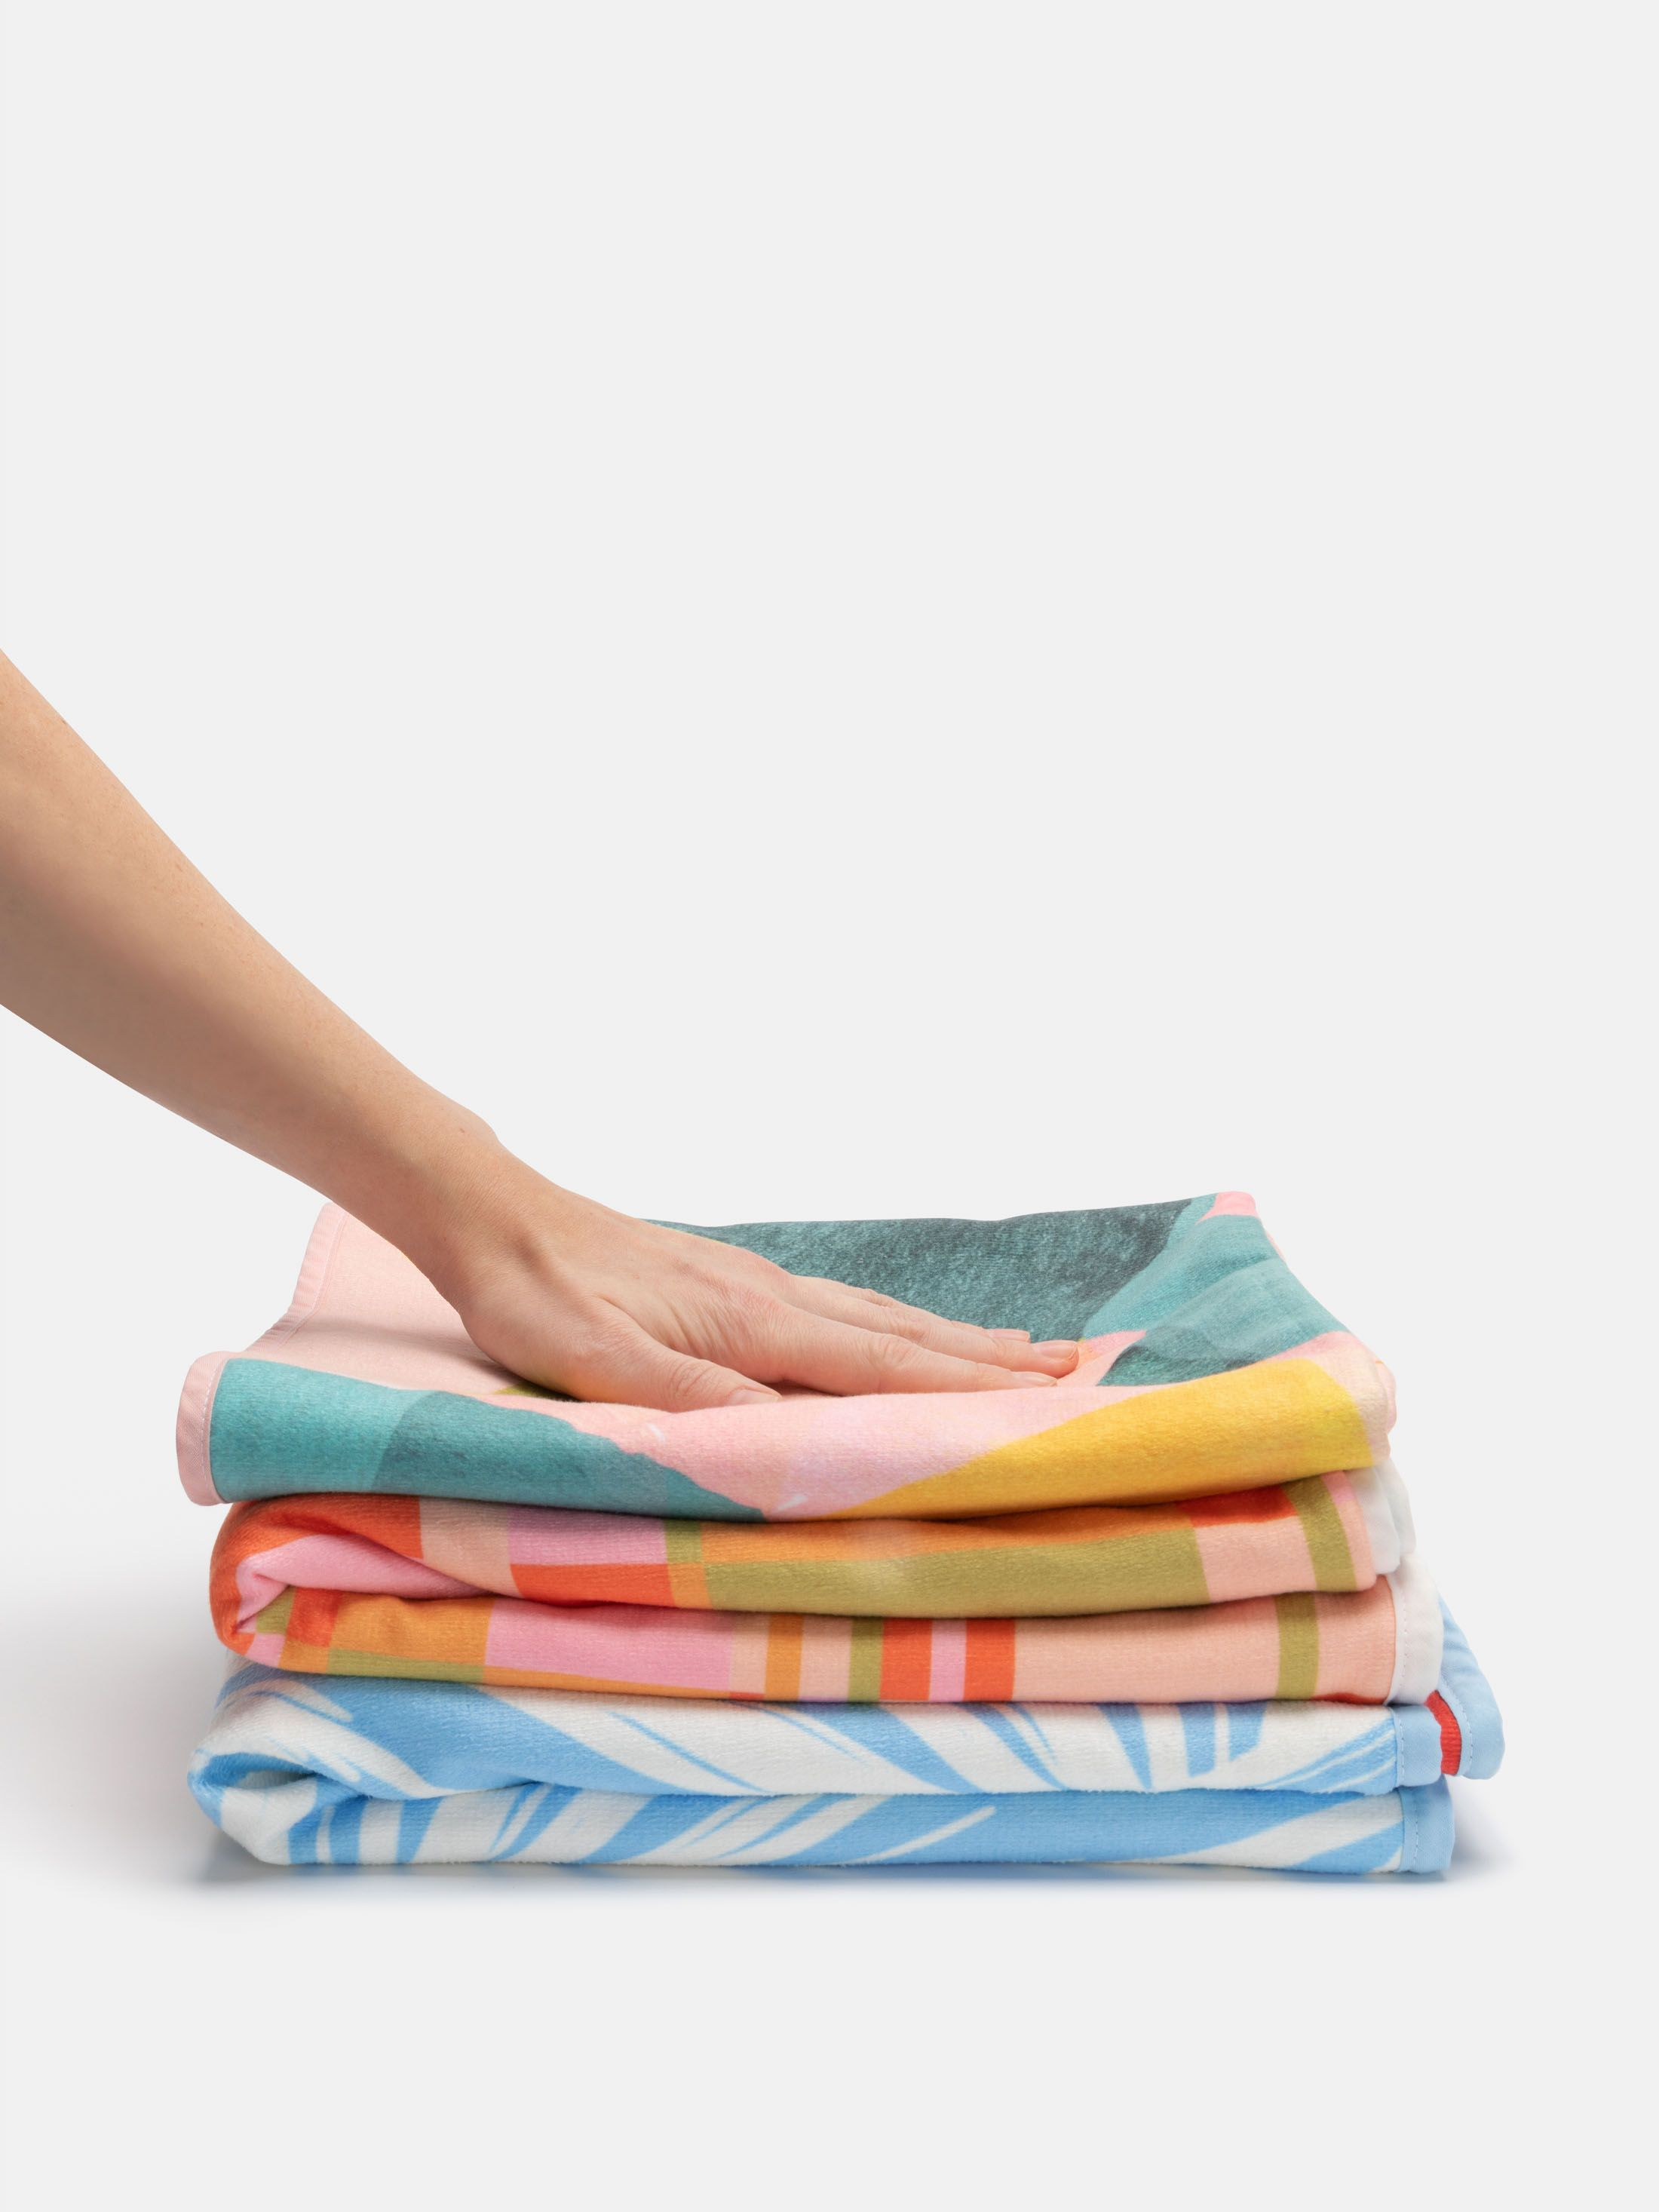 bathroom towel pile